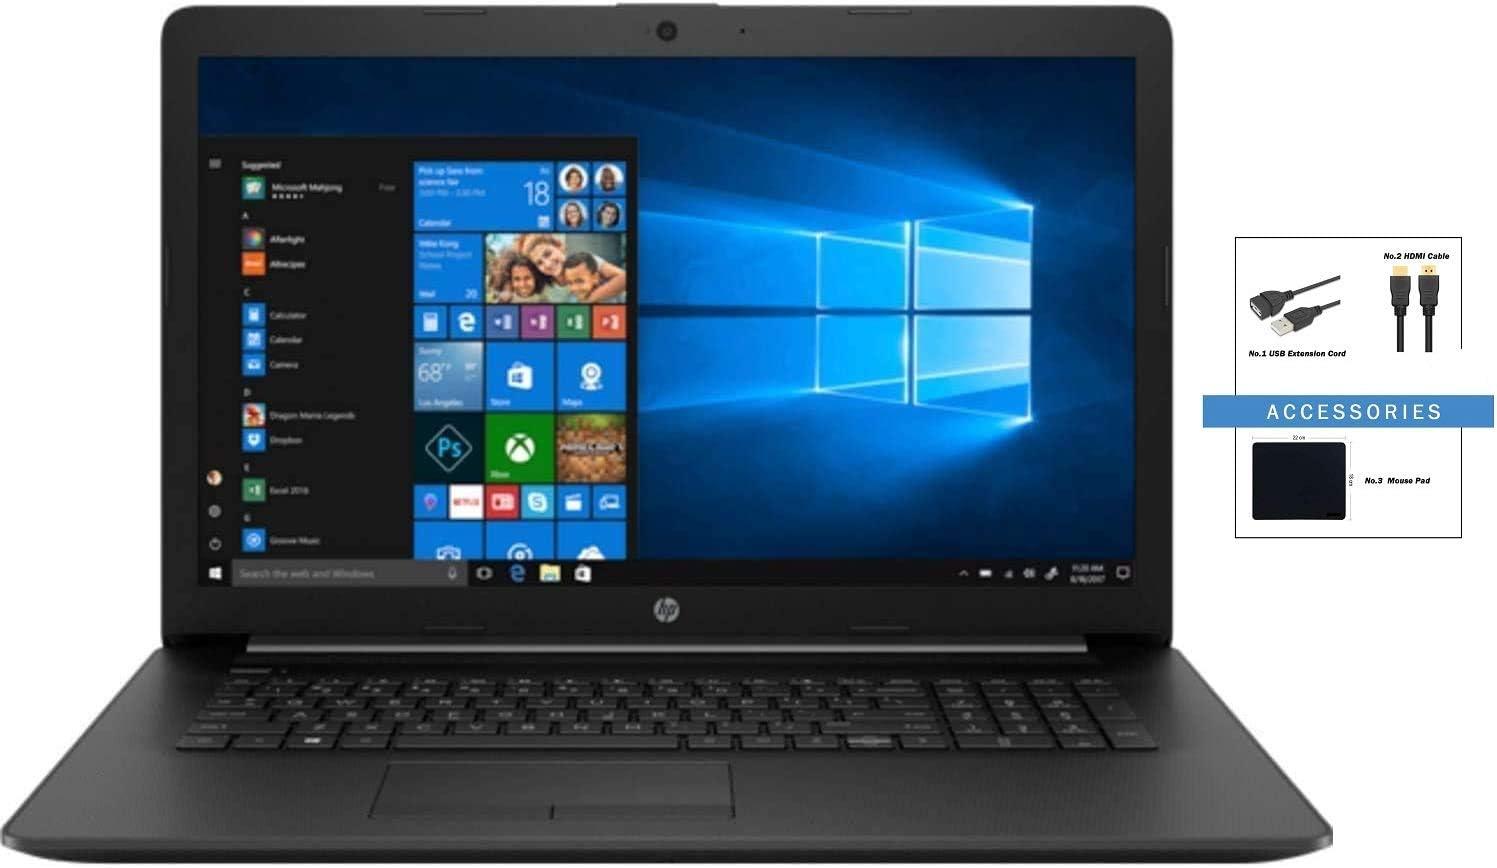 "HP 17z 17.3"" FHD IPS Anti-Glare WLED-Backlit Laptop Bundle Woov Accessory | AMD Ryzen 5 3500U | 12GB RAM | 256GB SSD | DVD-Writer | AMD Radeon Vega 8 Graphics | Windows 10 Home 64 | Black"